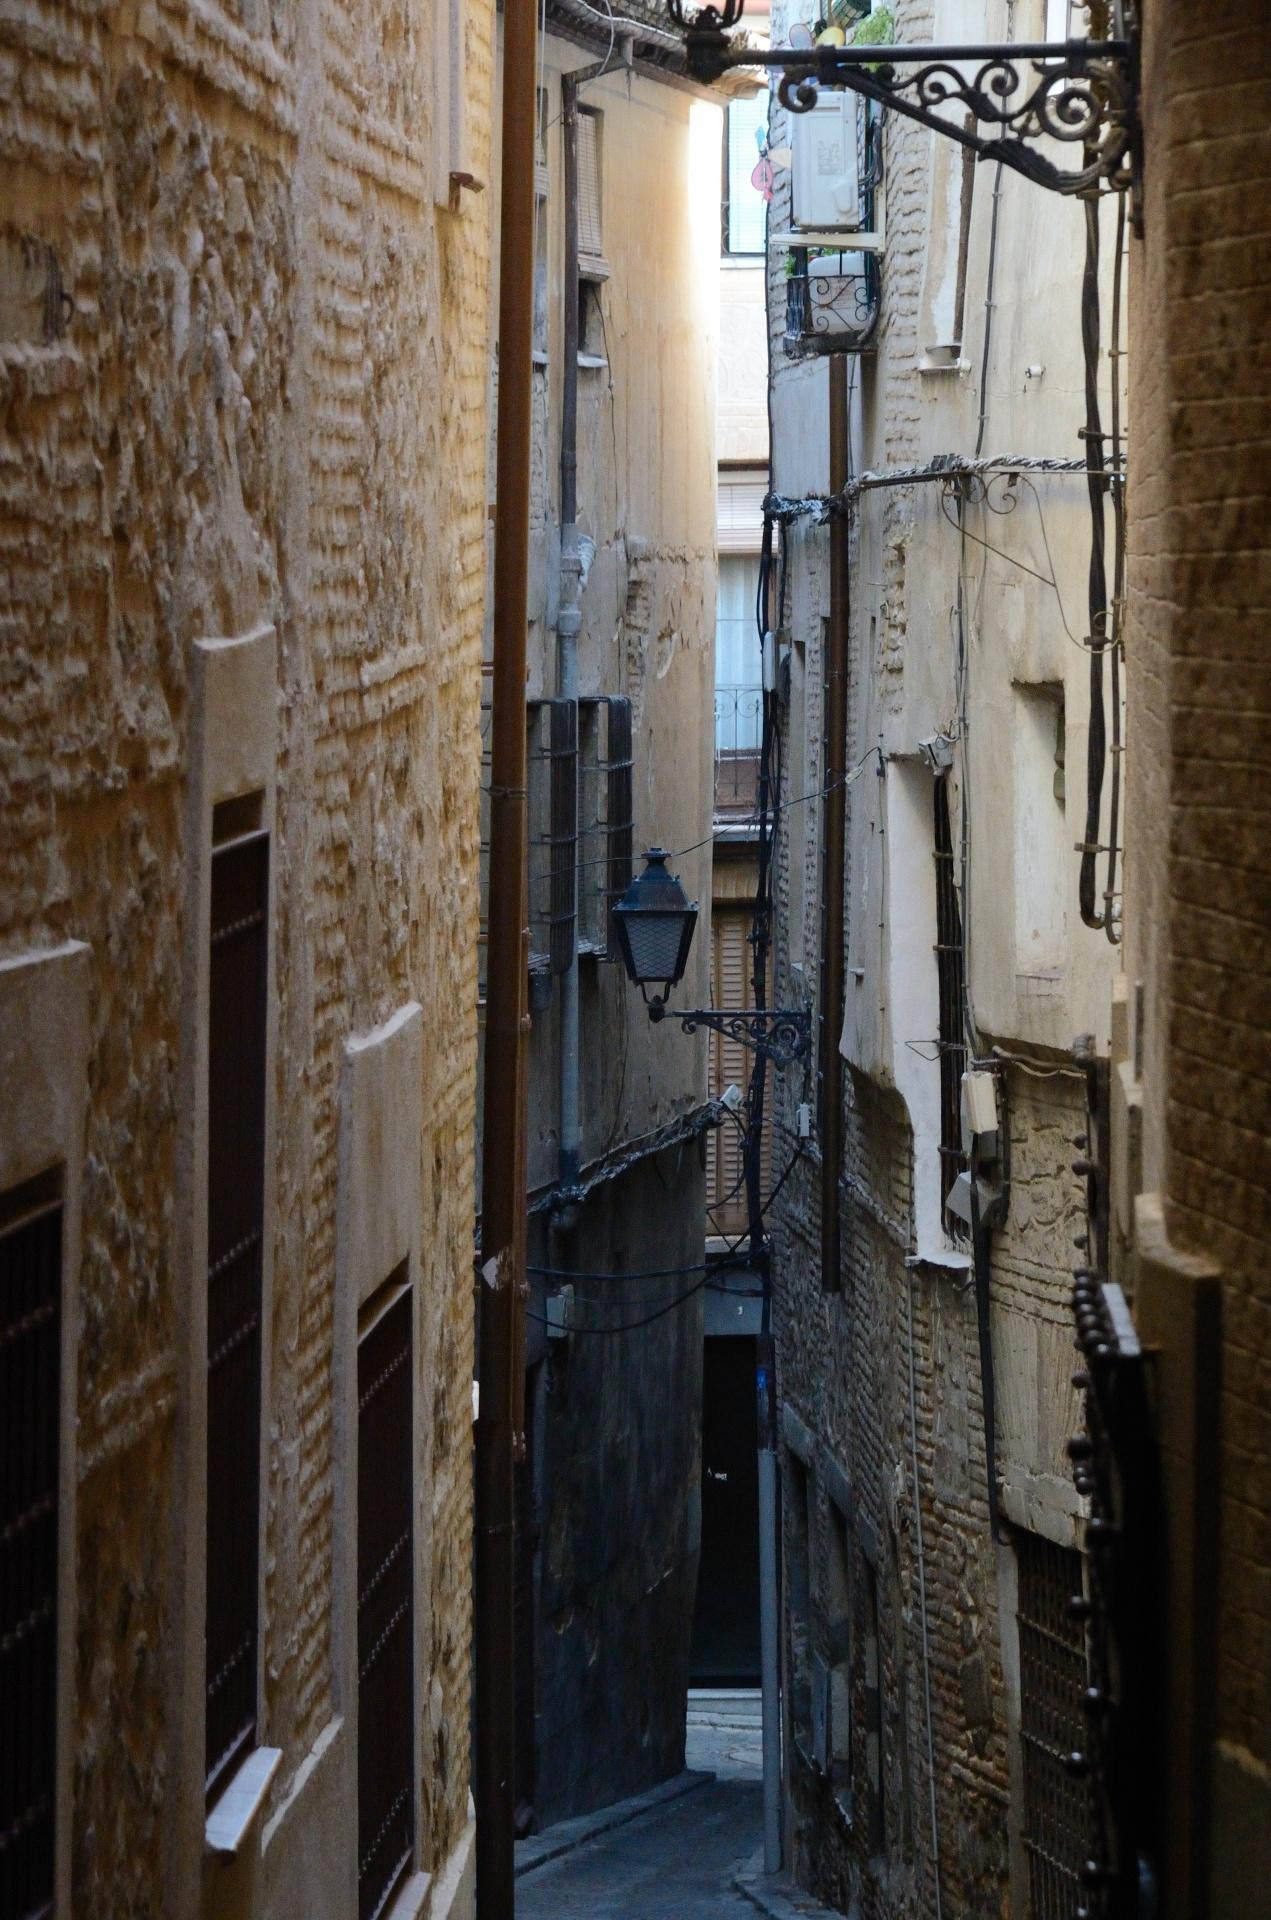 Narrow street in historical part of Toledo, Spain